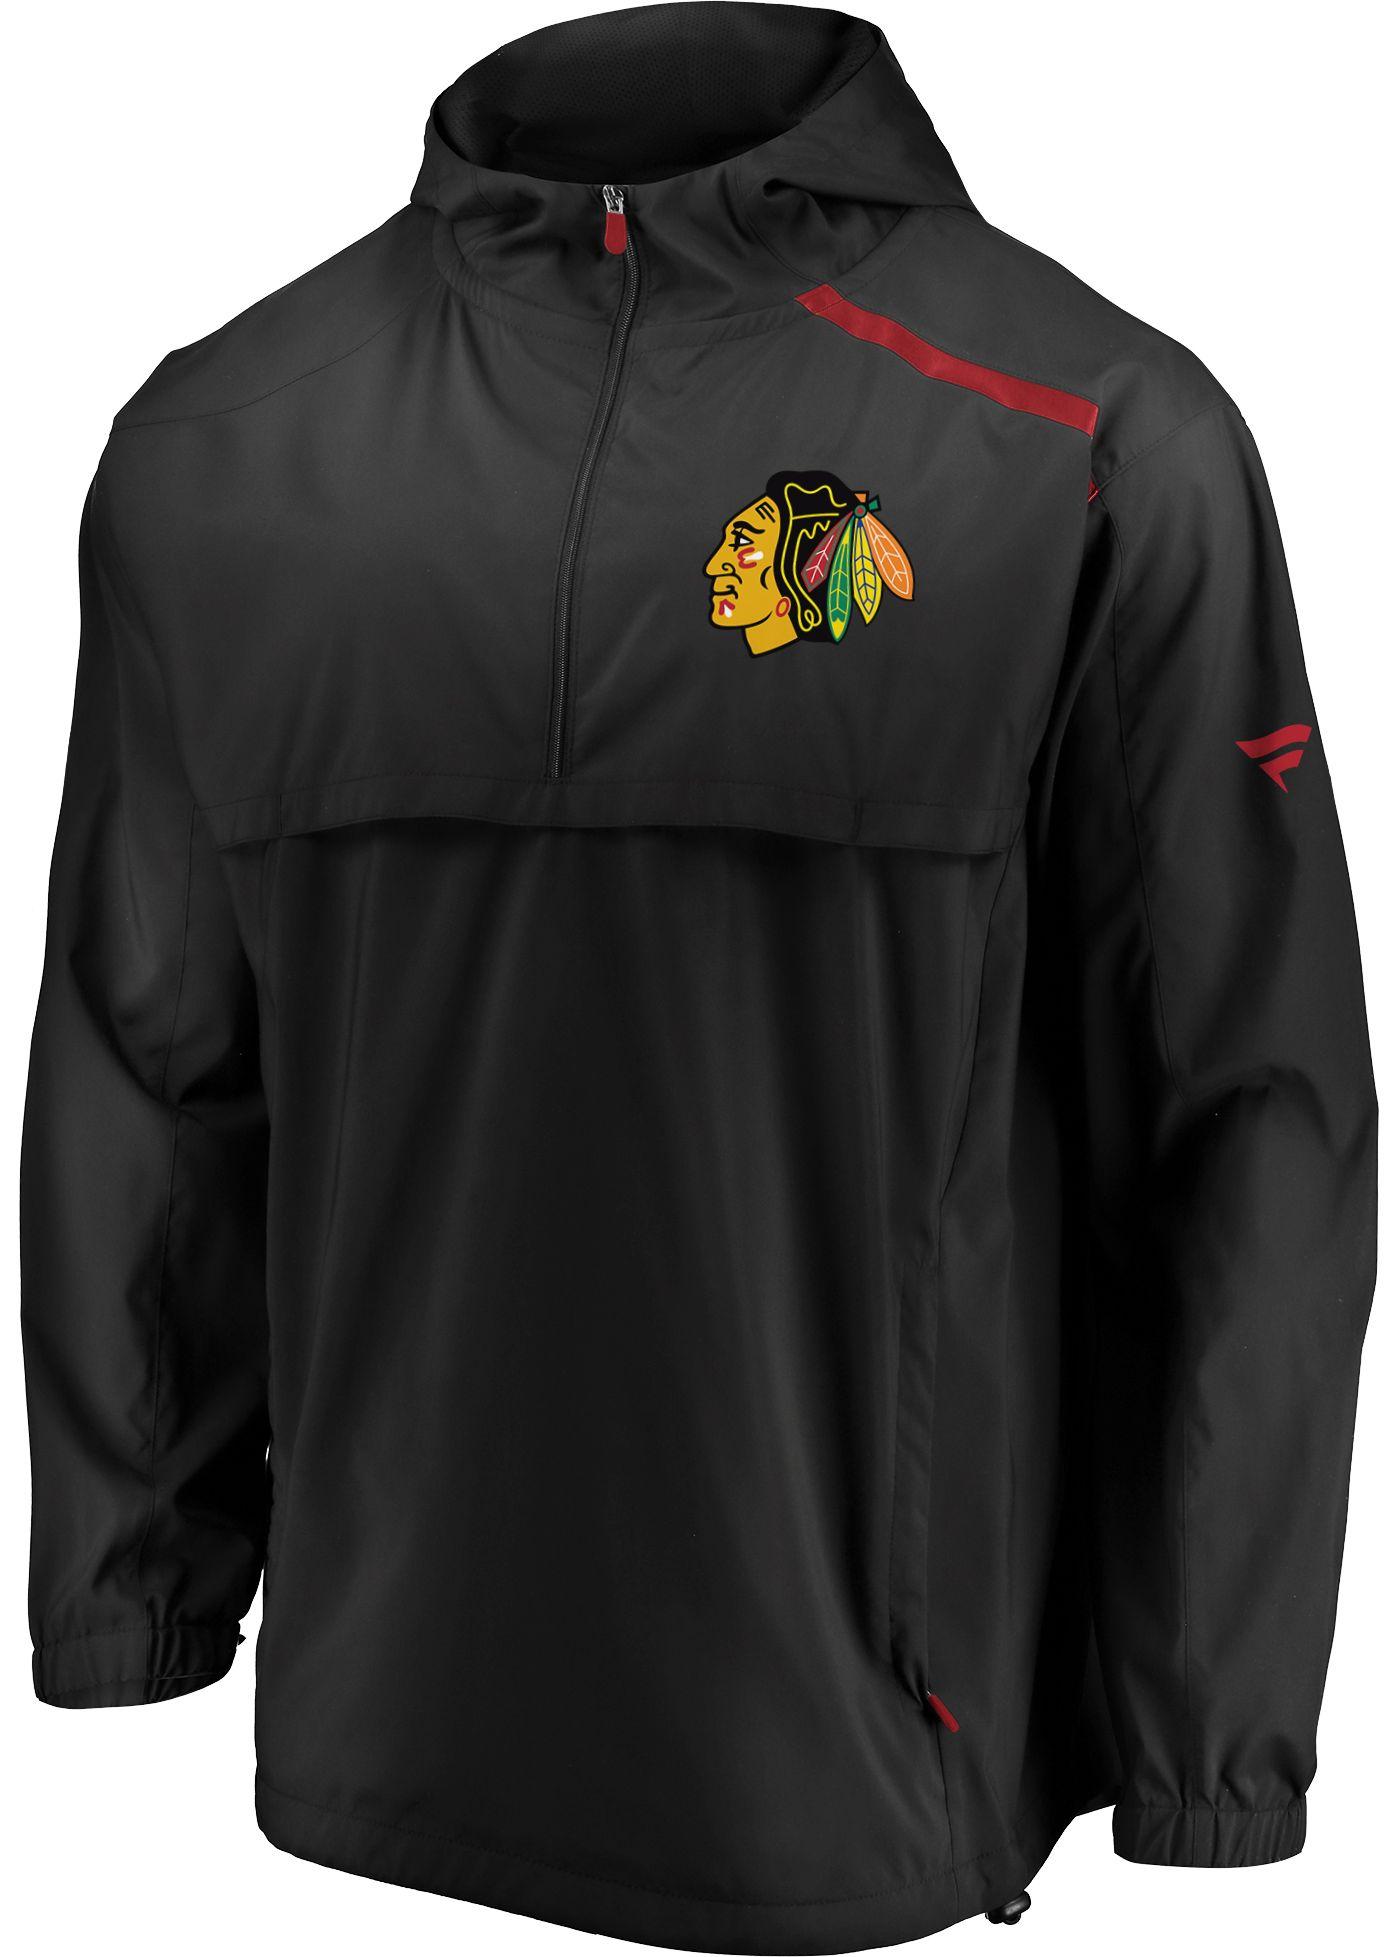 NHL Men's Chicago Blackhawks Authentic Pro Black Anorak Jacket